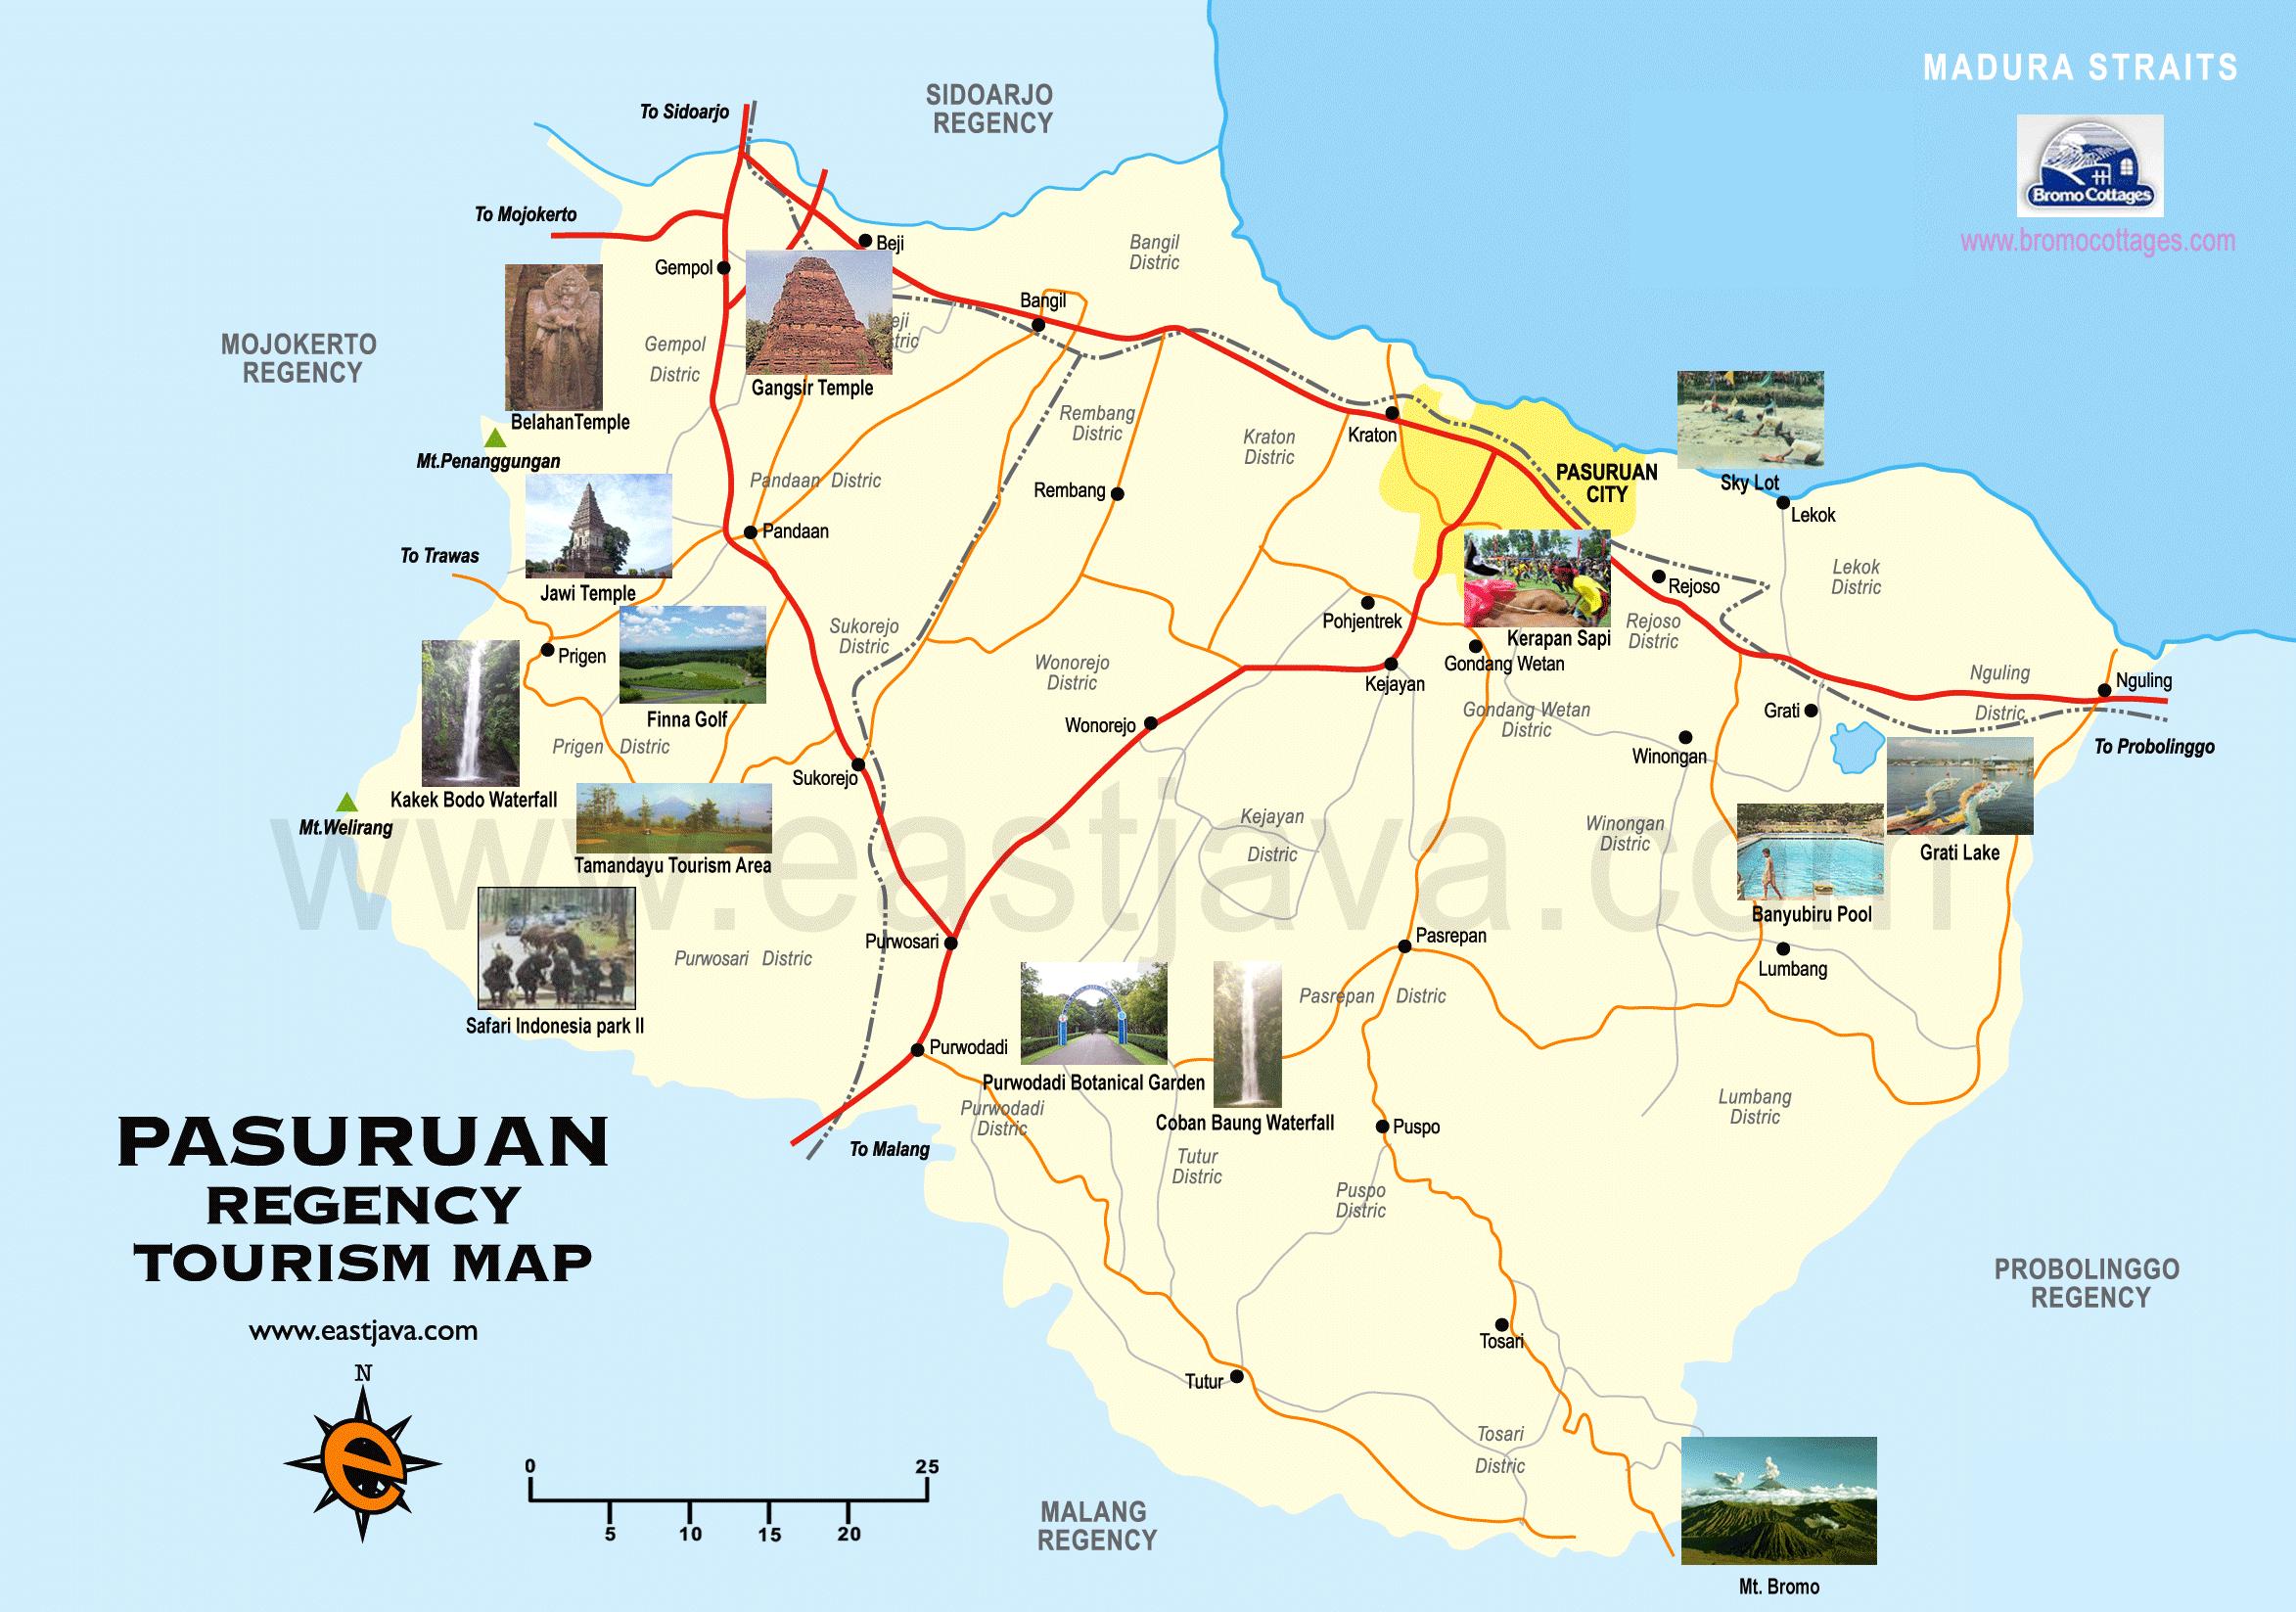 Peta Kabupaten Kota Pasuruan Meliputi Wisata Candi Belahan Kab